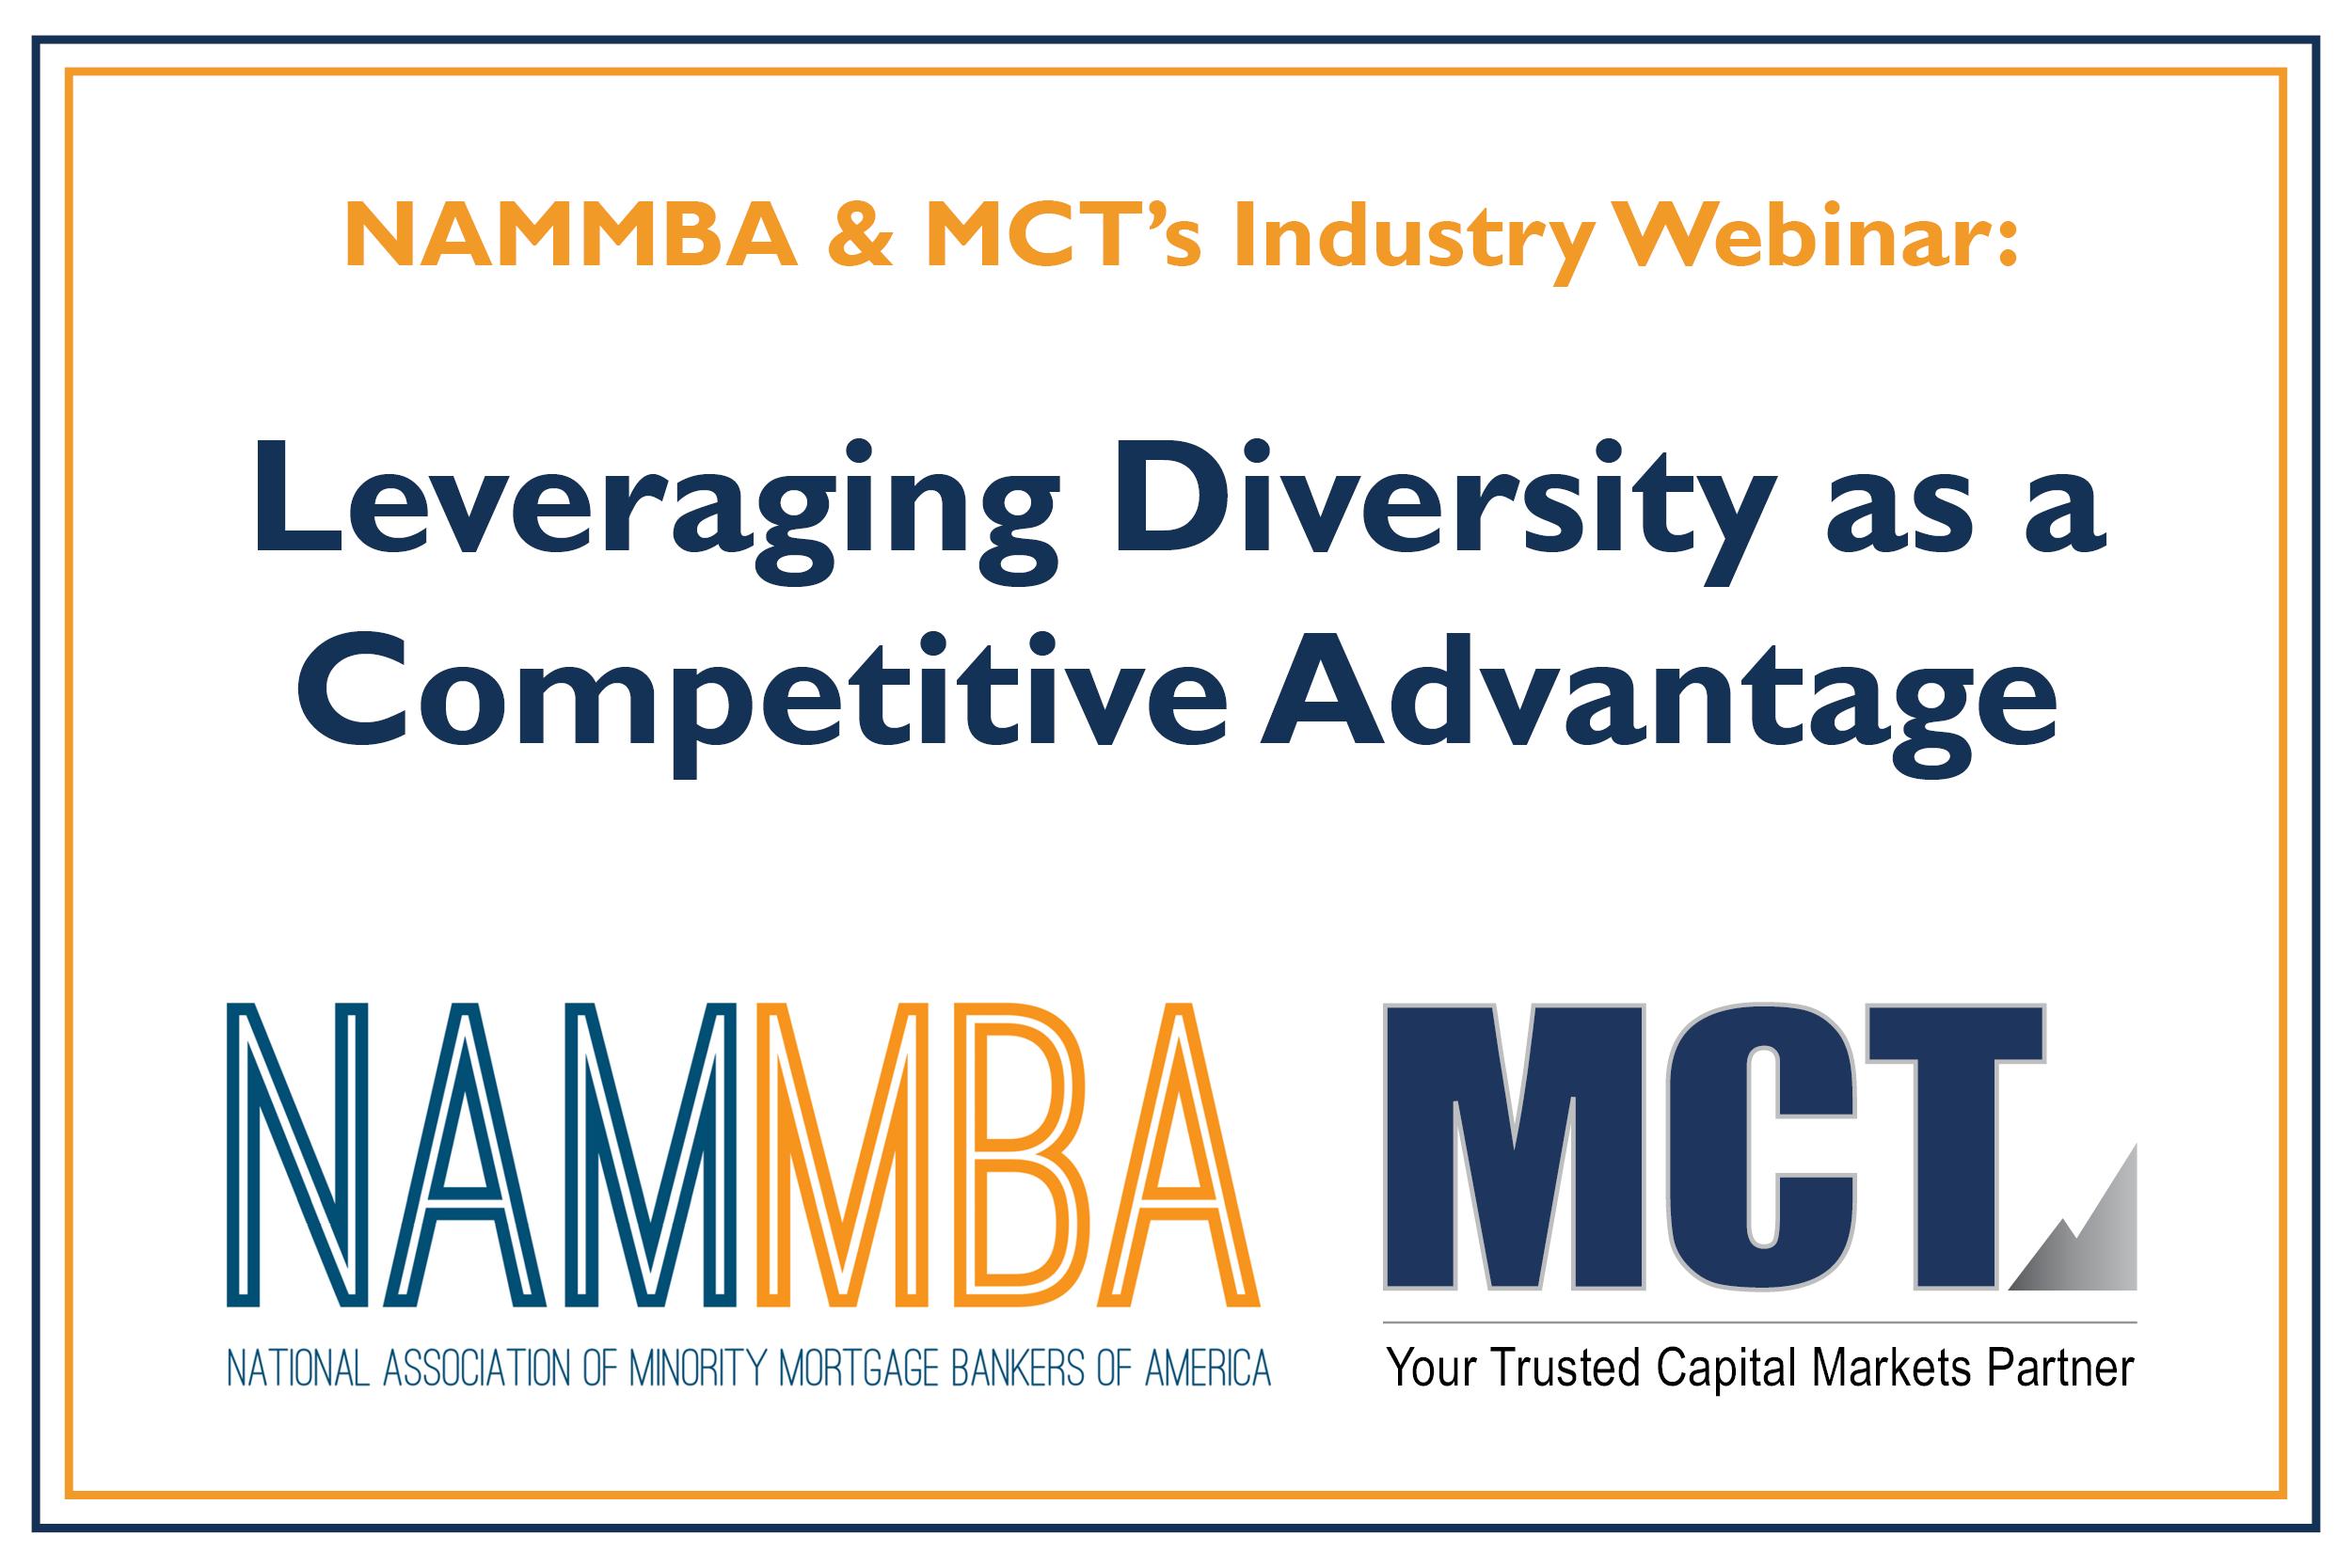 NAMMBA & MCT Webinar – Leveraging Diversity as a Competitive Advantage